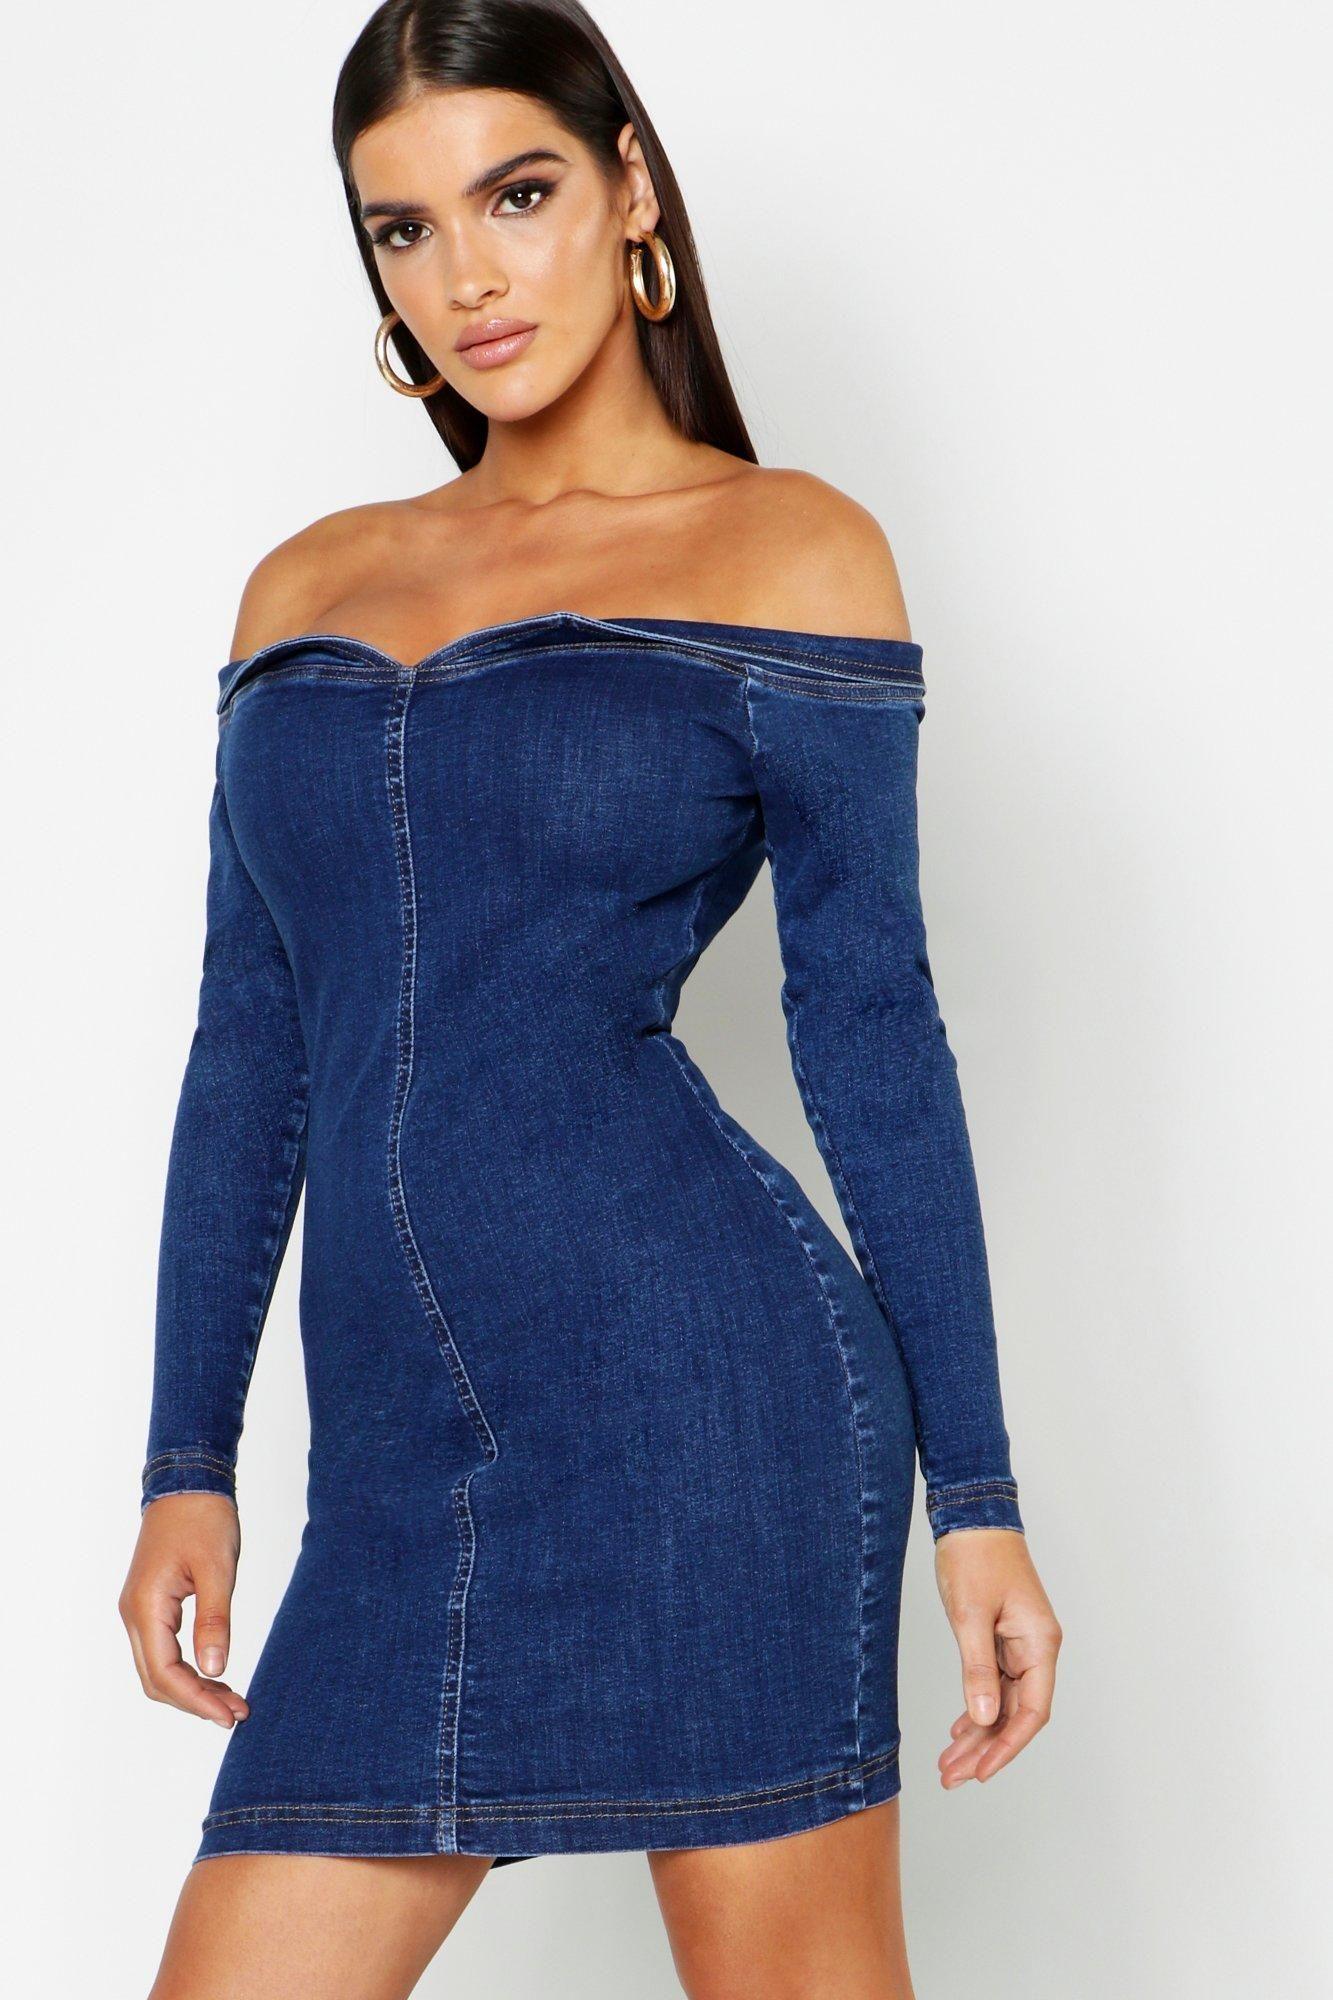 Bodycon Off The Shoulder Stretch Denim Dress Denim dress